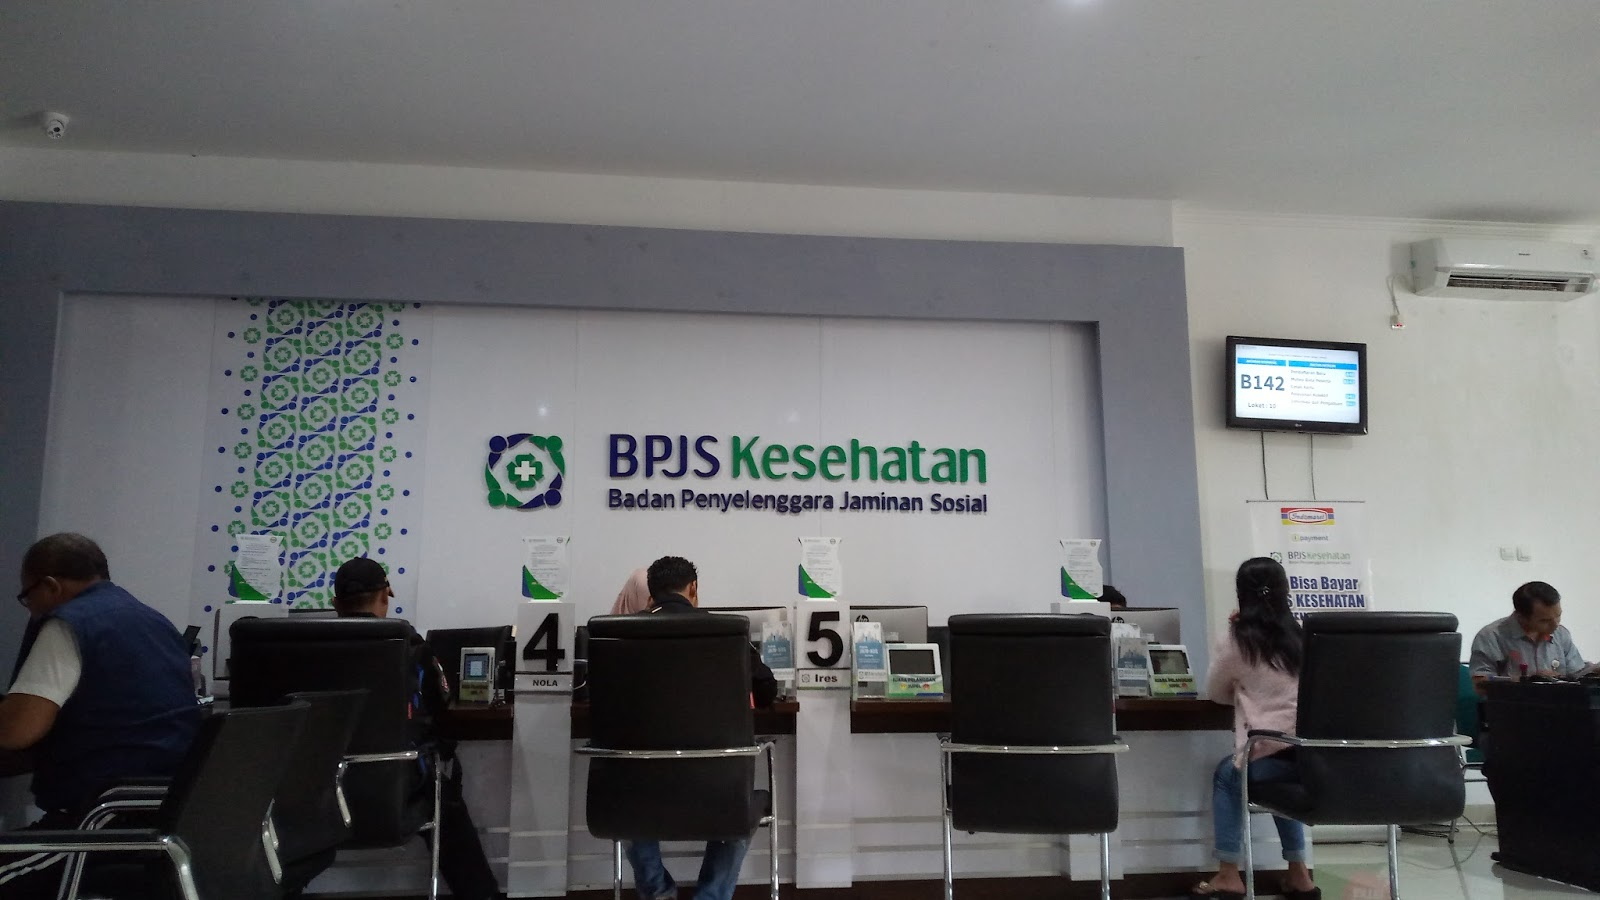 Bikin BPJS di Cibinong